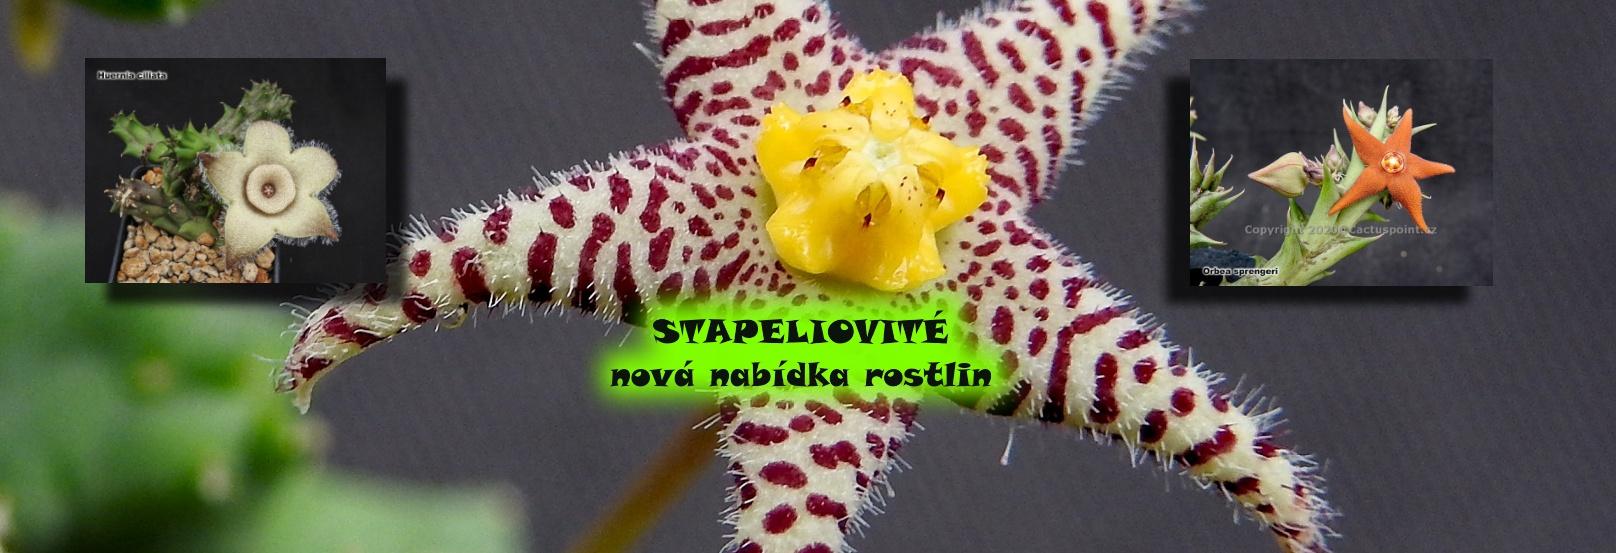 stapeliovit1